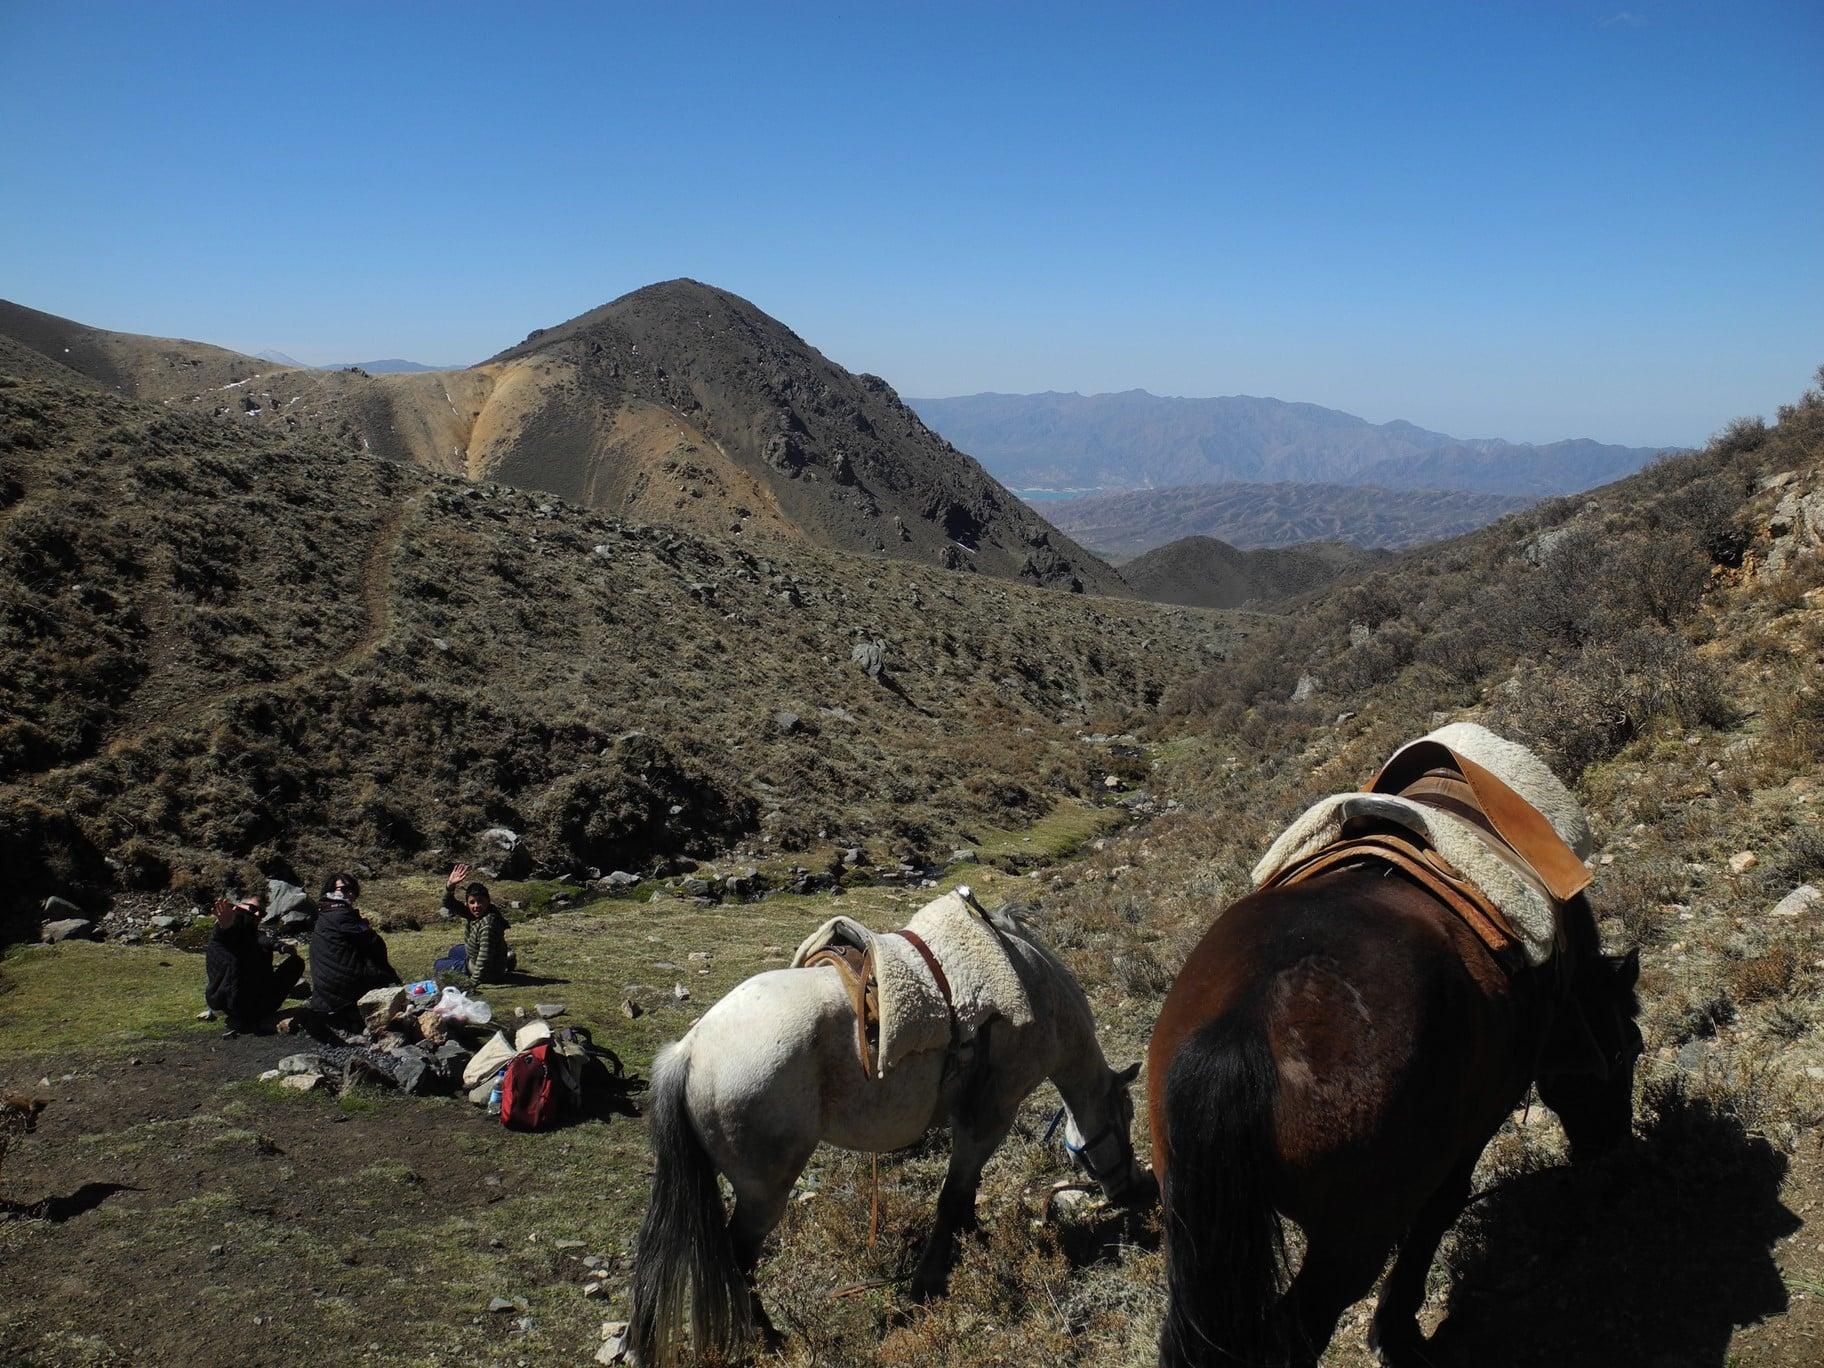 wine-TROTTERS_wine-tourism-agency_tour_trekking_hiking_horseback-riding_Andes_97 WEB.jpg